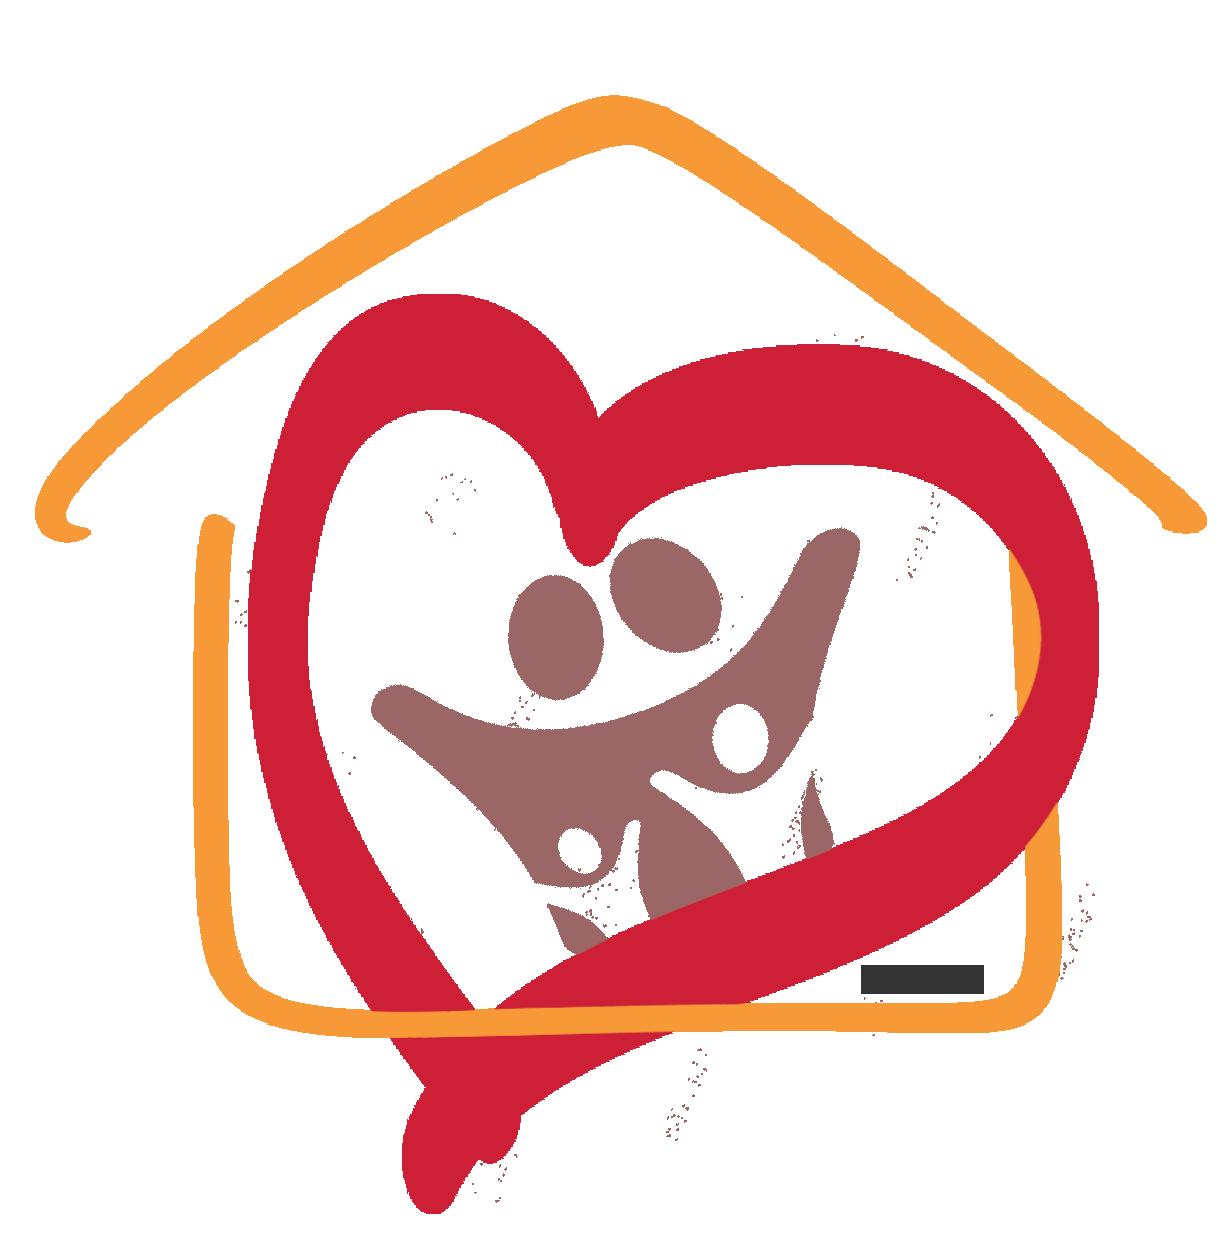 NFCAM National Foster Care Association Malta